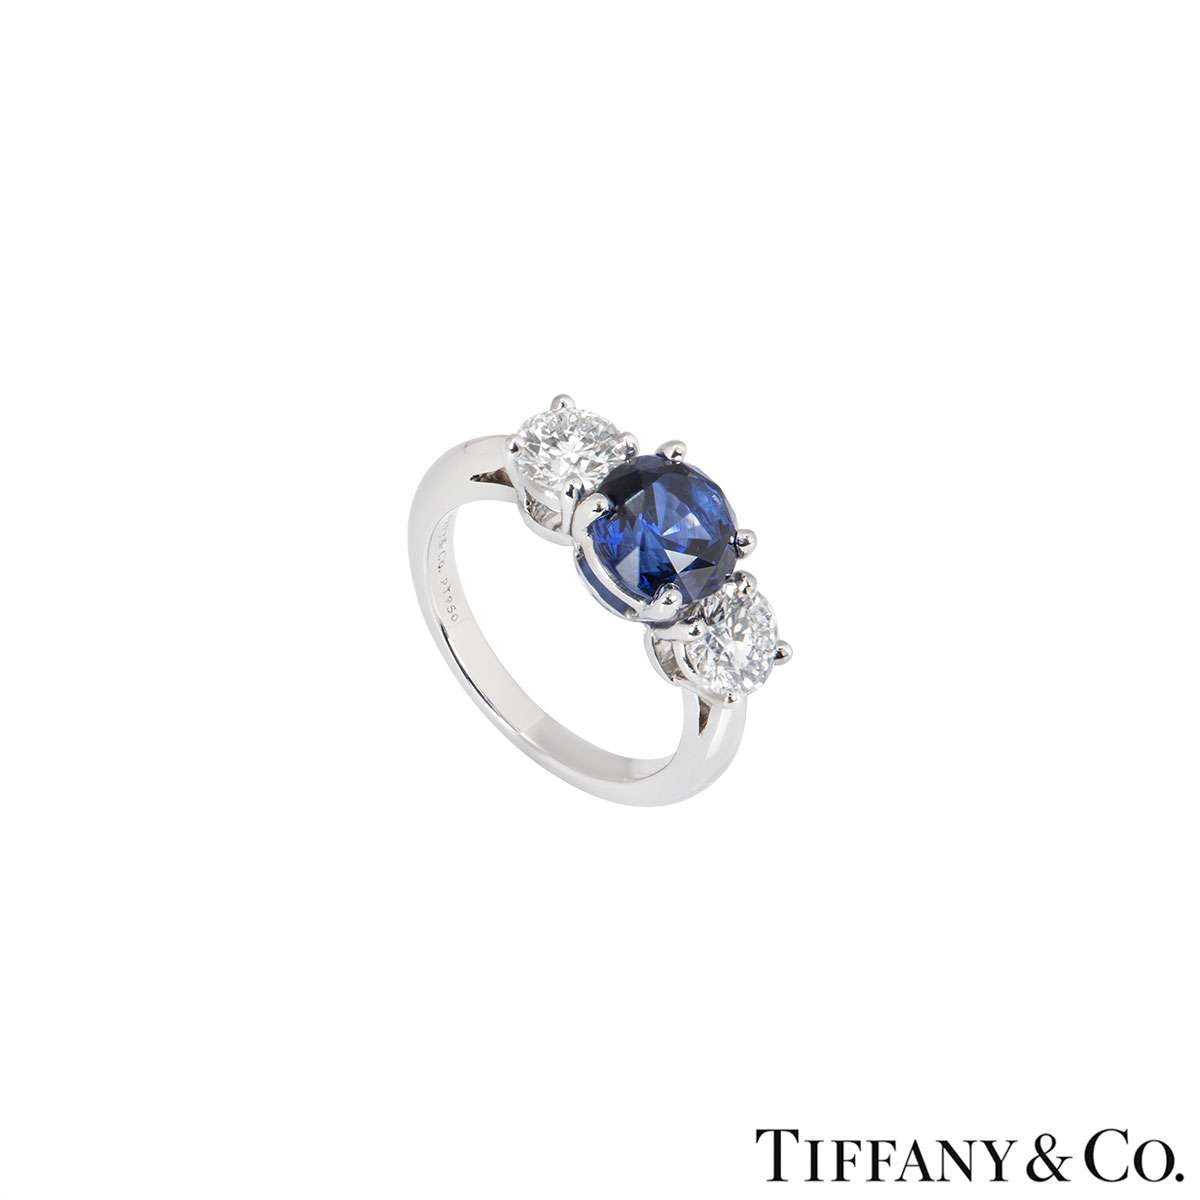 Tiffany & Co. Three Stone Diamond and Sapphire Platinum Ring